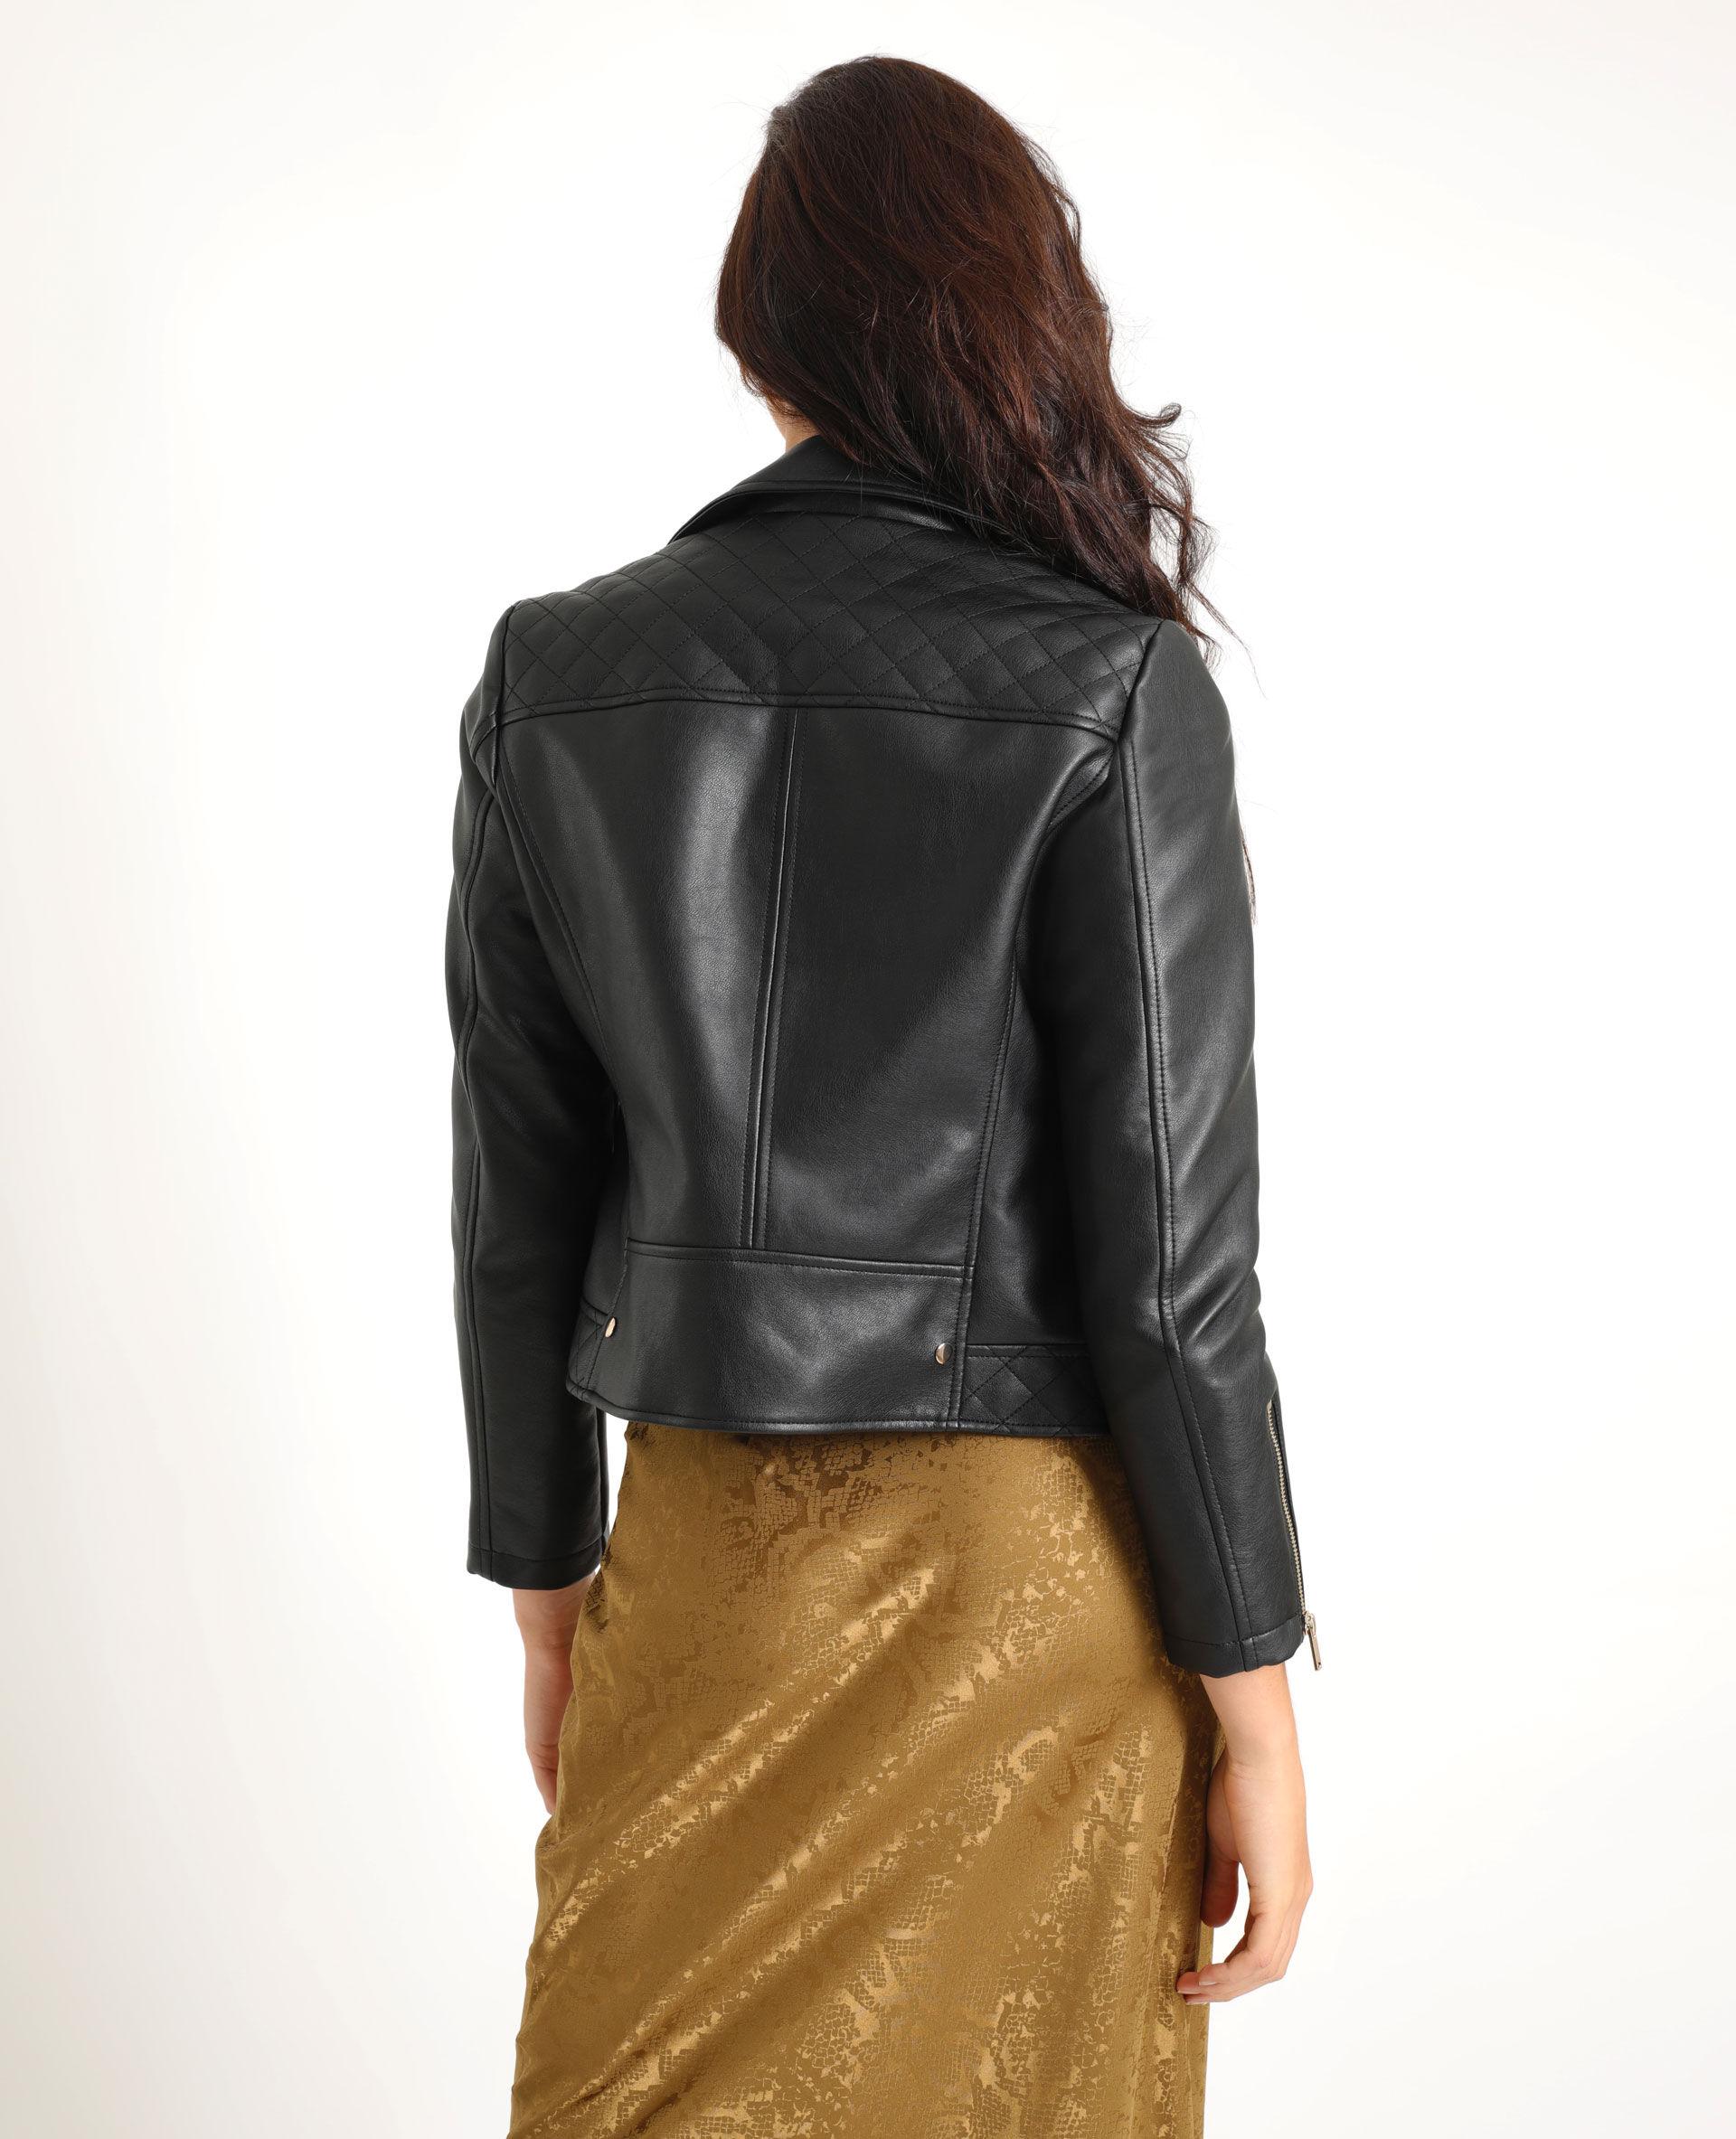 Veste marron femme pimkie